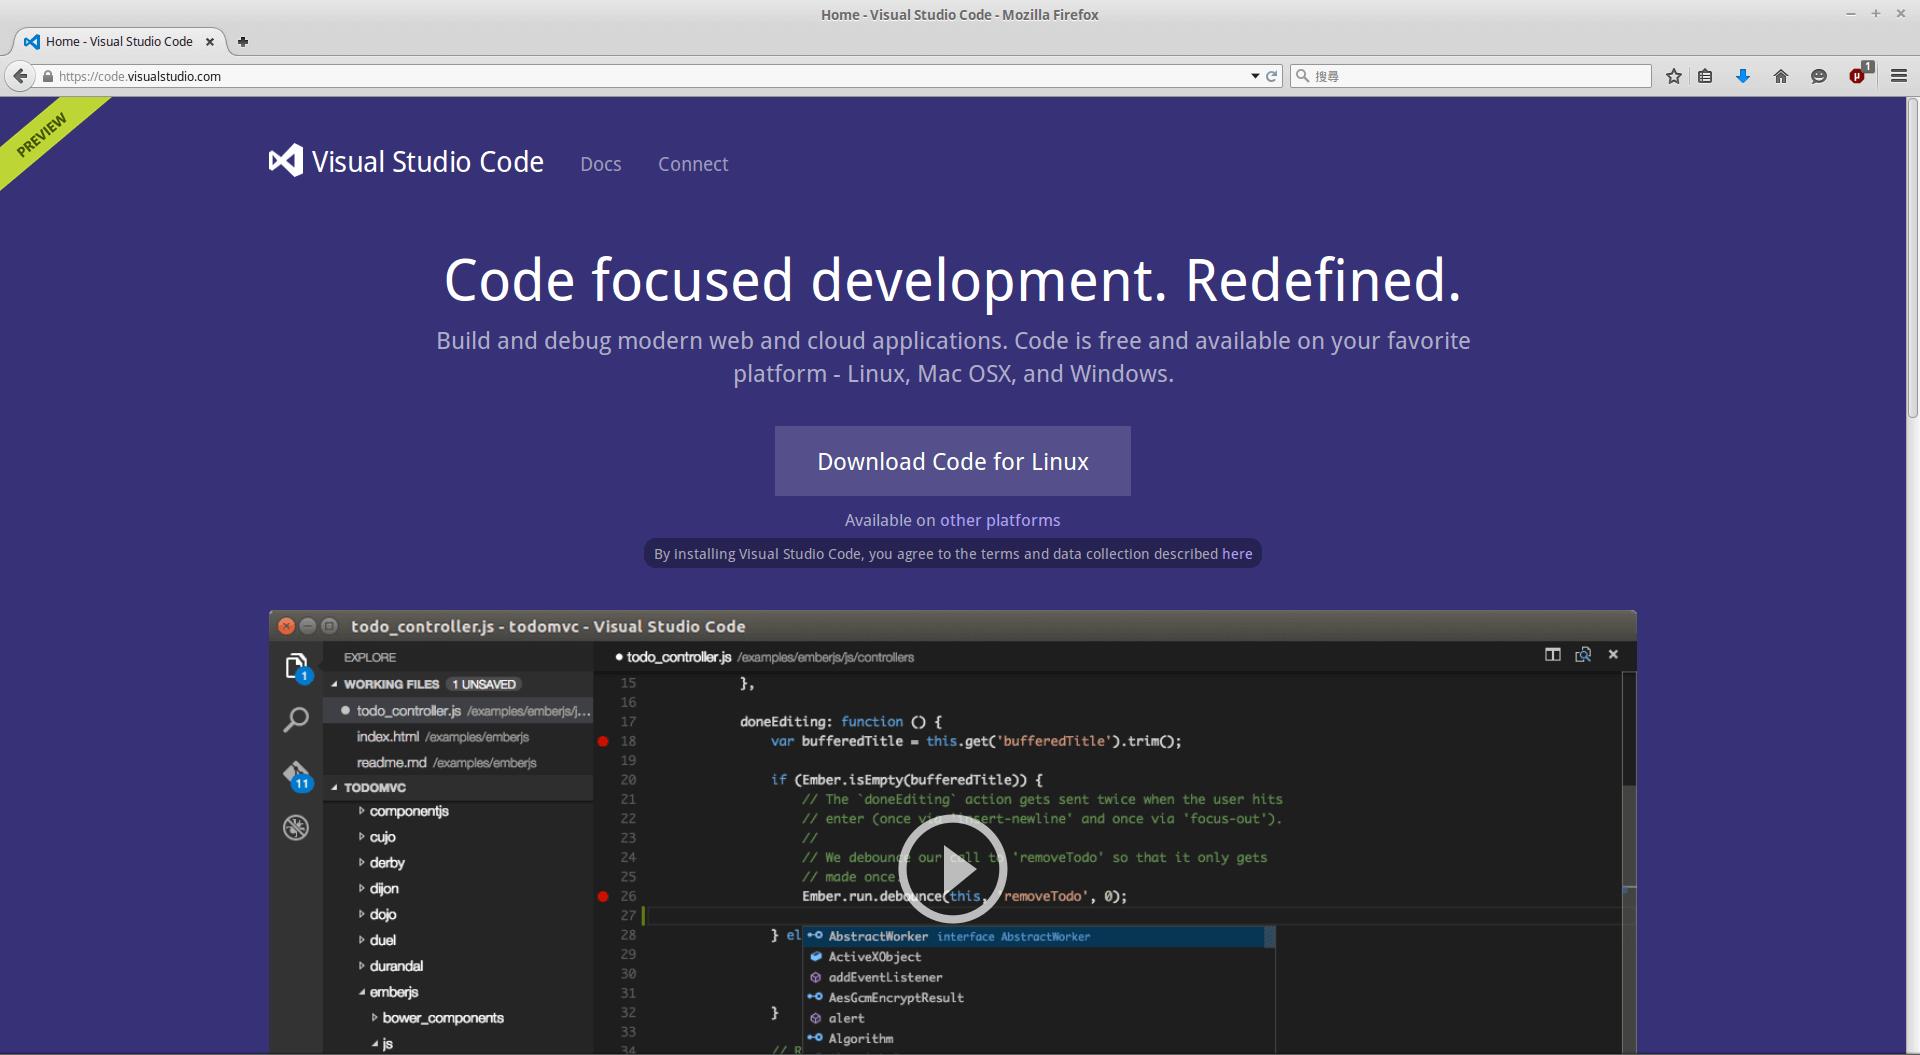 MicrosoftVisualStudioCodePreviewWebsite2